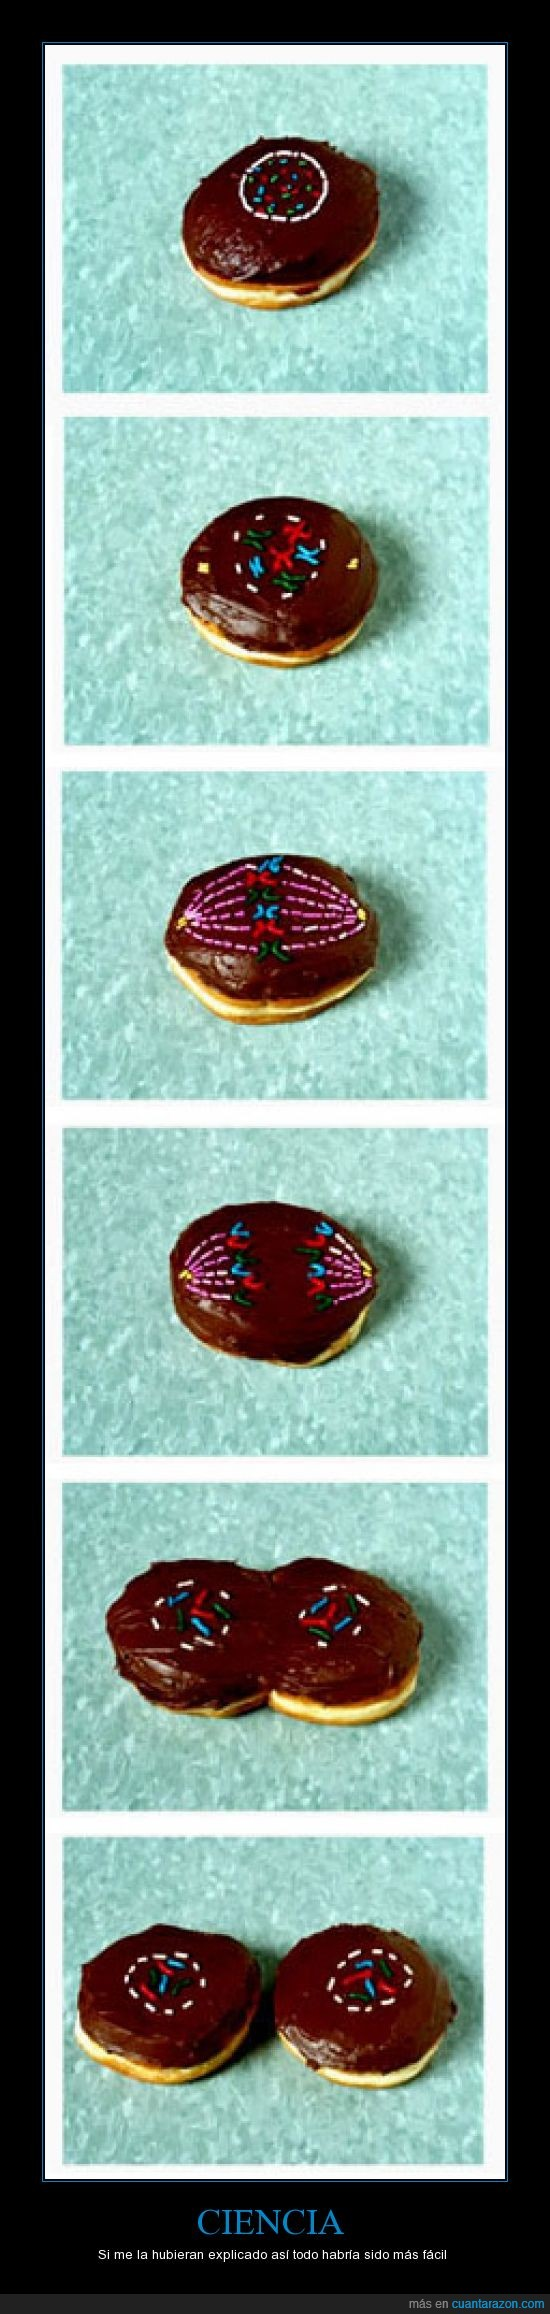 celulas,chocolate,crecer,división,donutm nutella,dulce,explicación,mitosis,reproducción